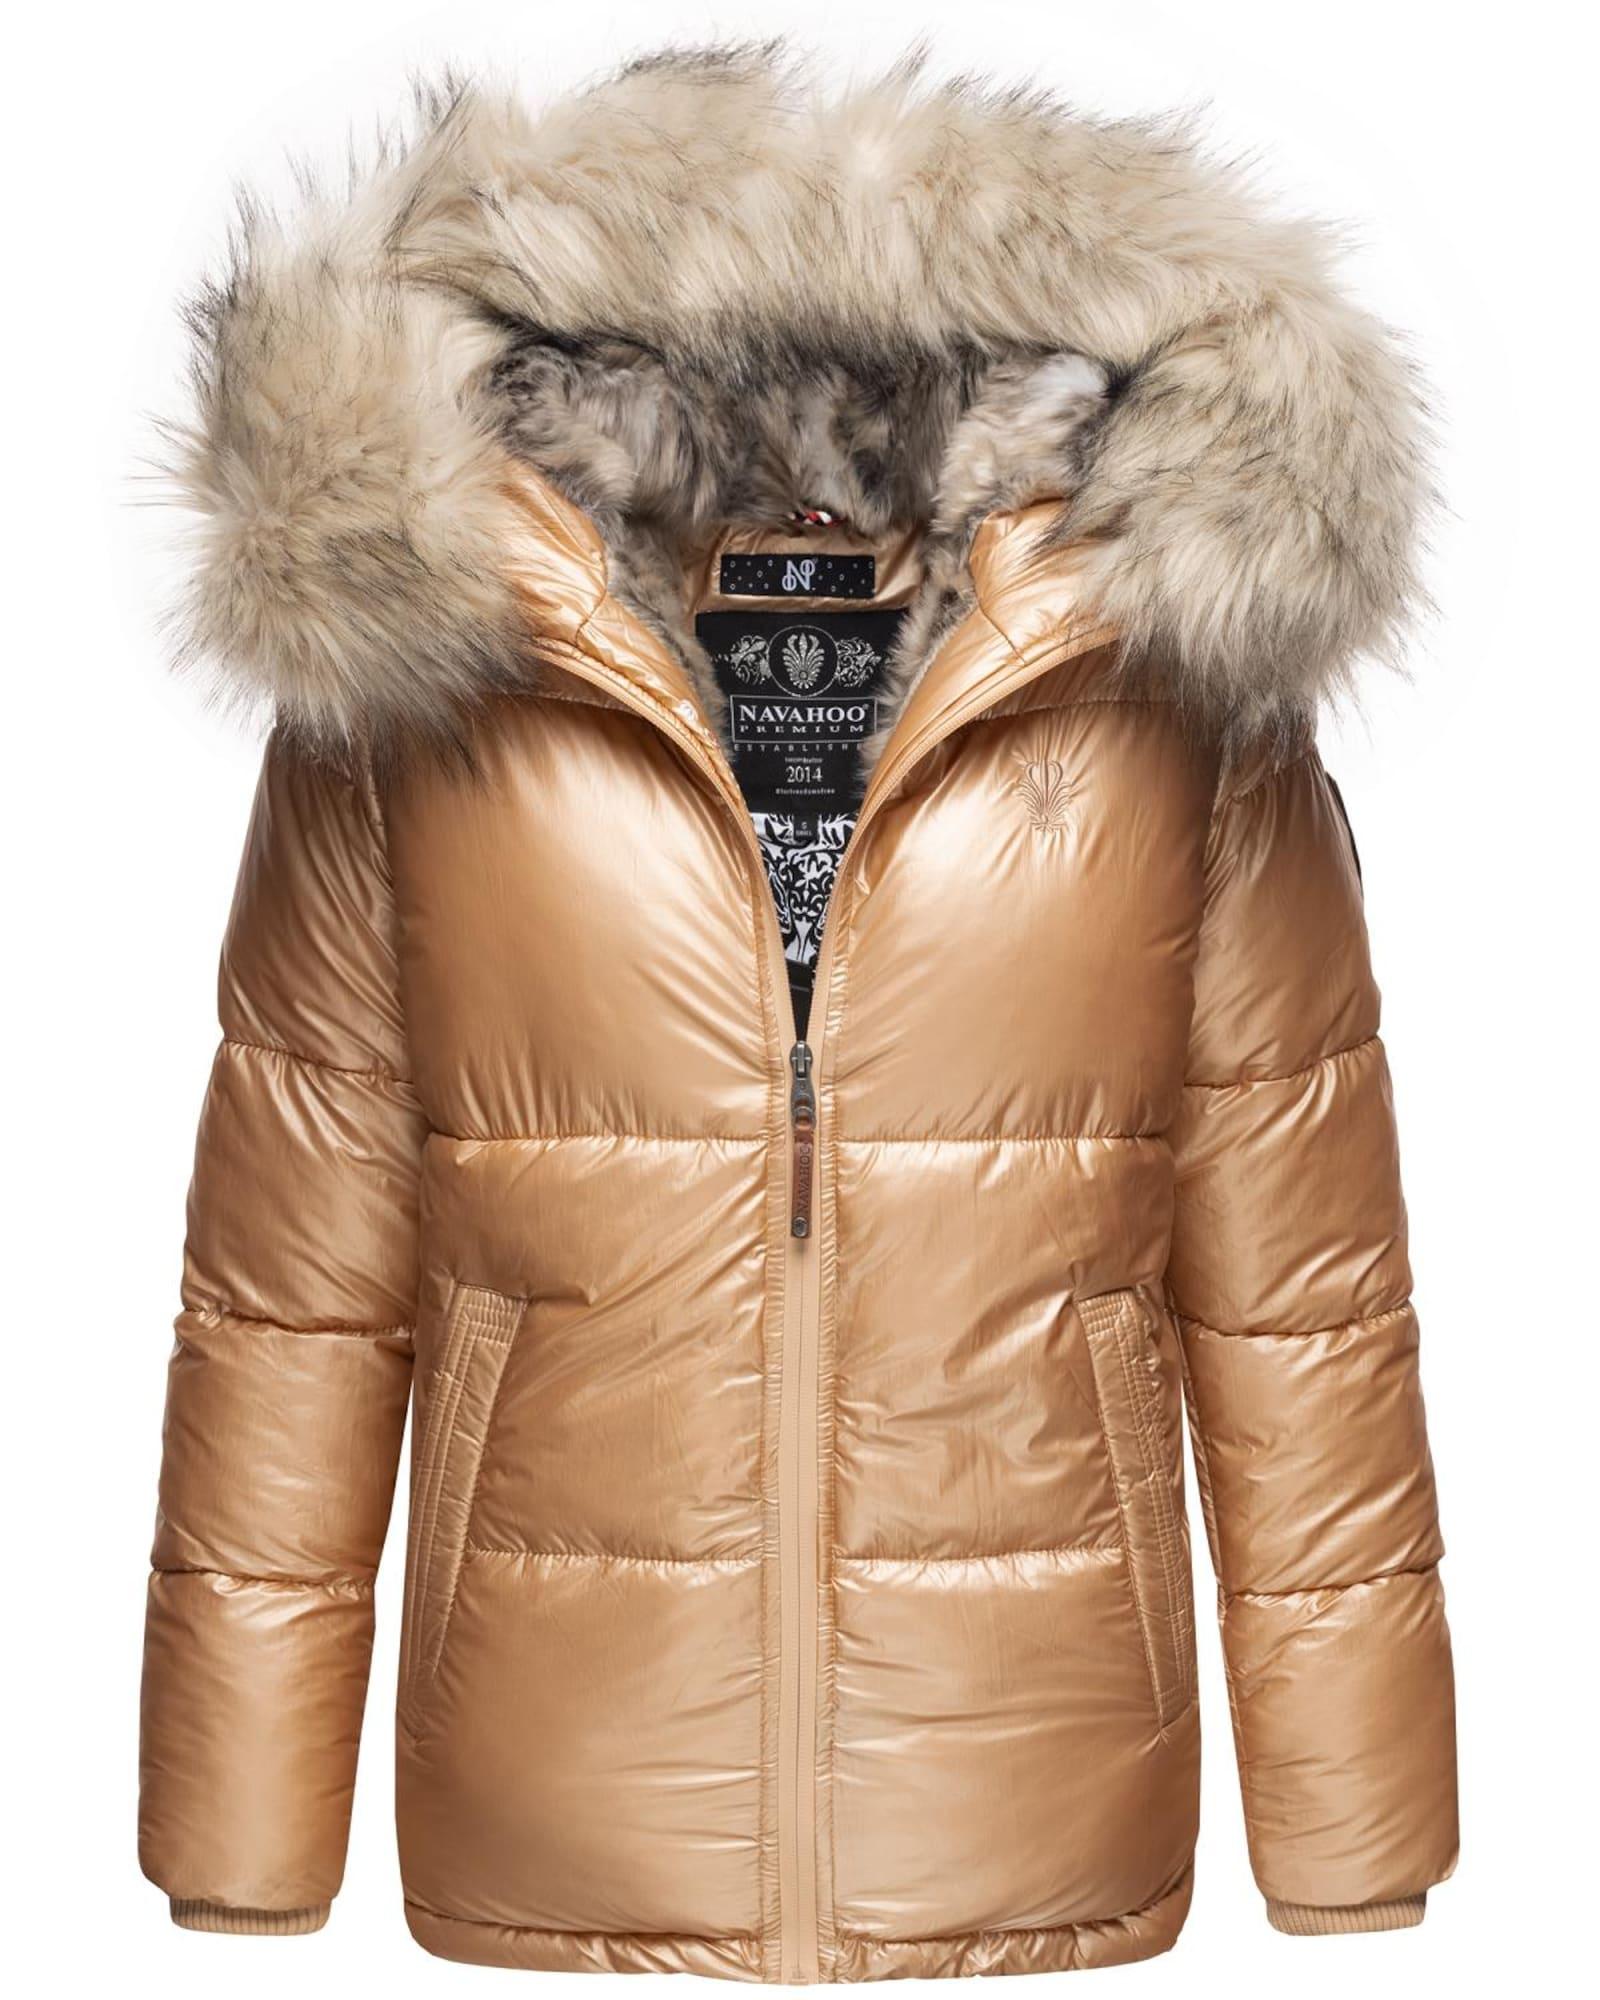 Winterjacke 'Tikunaa' | Bekleidung > Jacken > Winterjacken | NAVAHOO